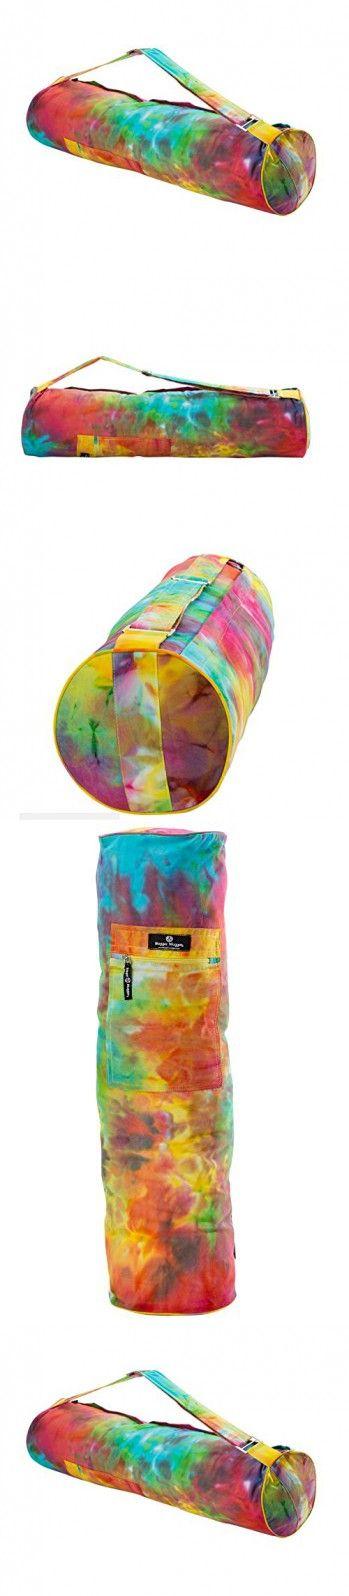 Hugger Mugger Batik Tie Dye Yoga Mat Bag